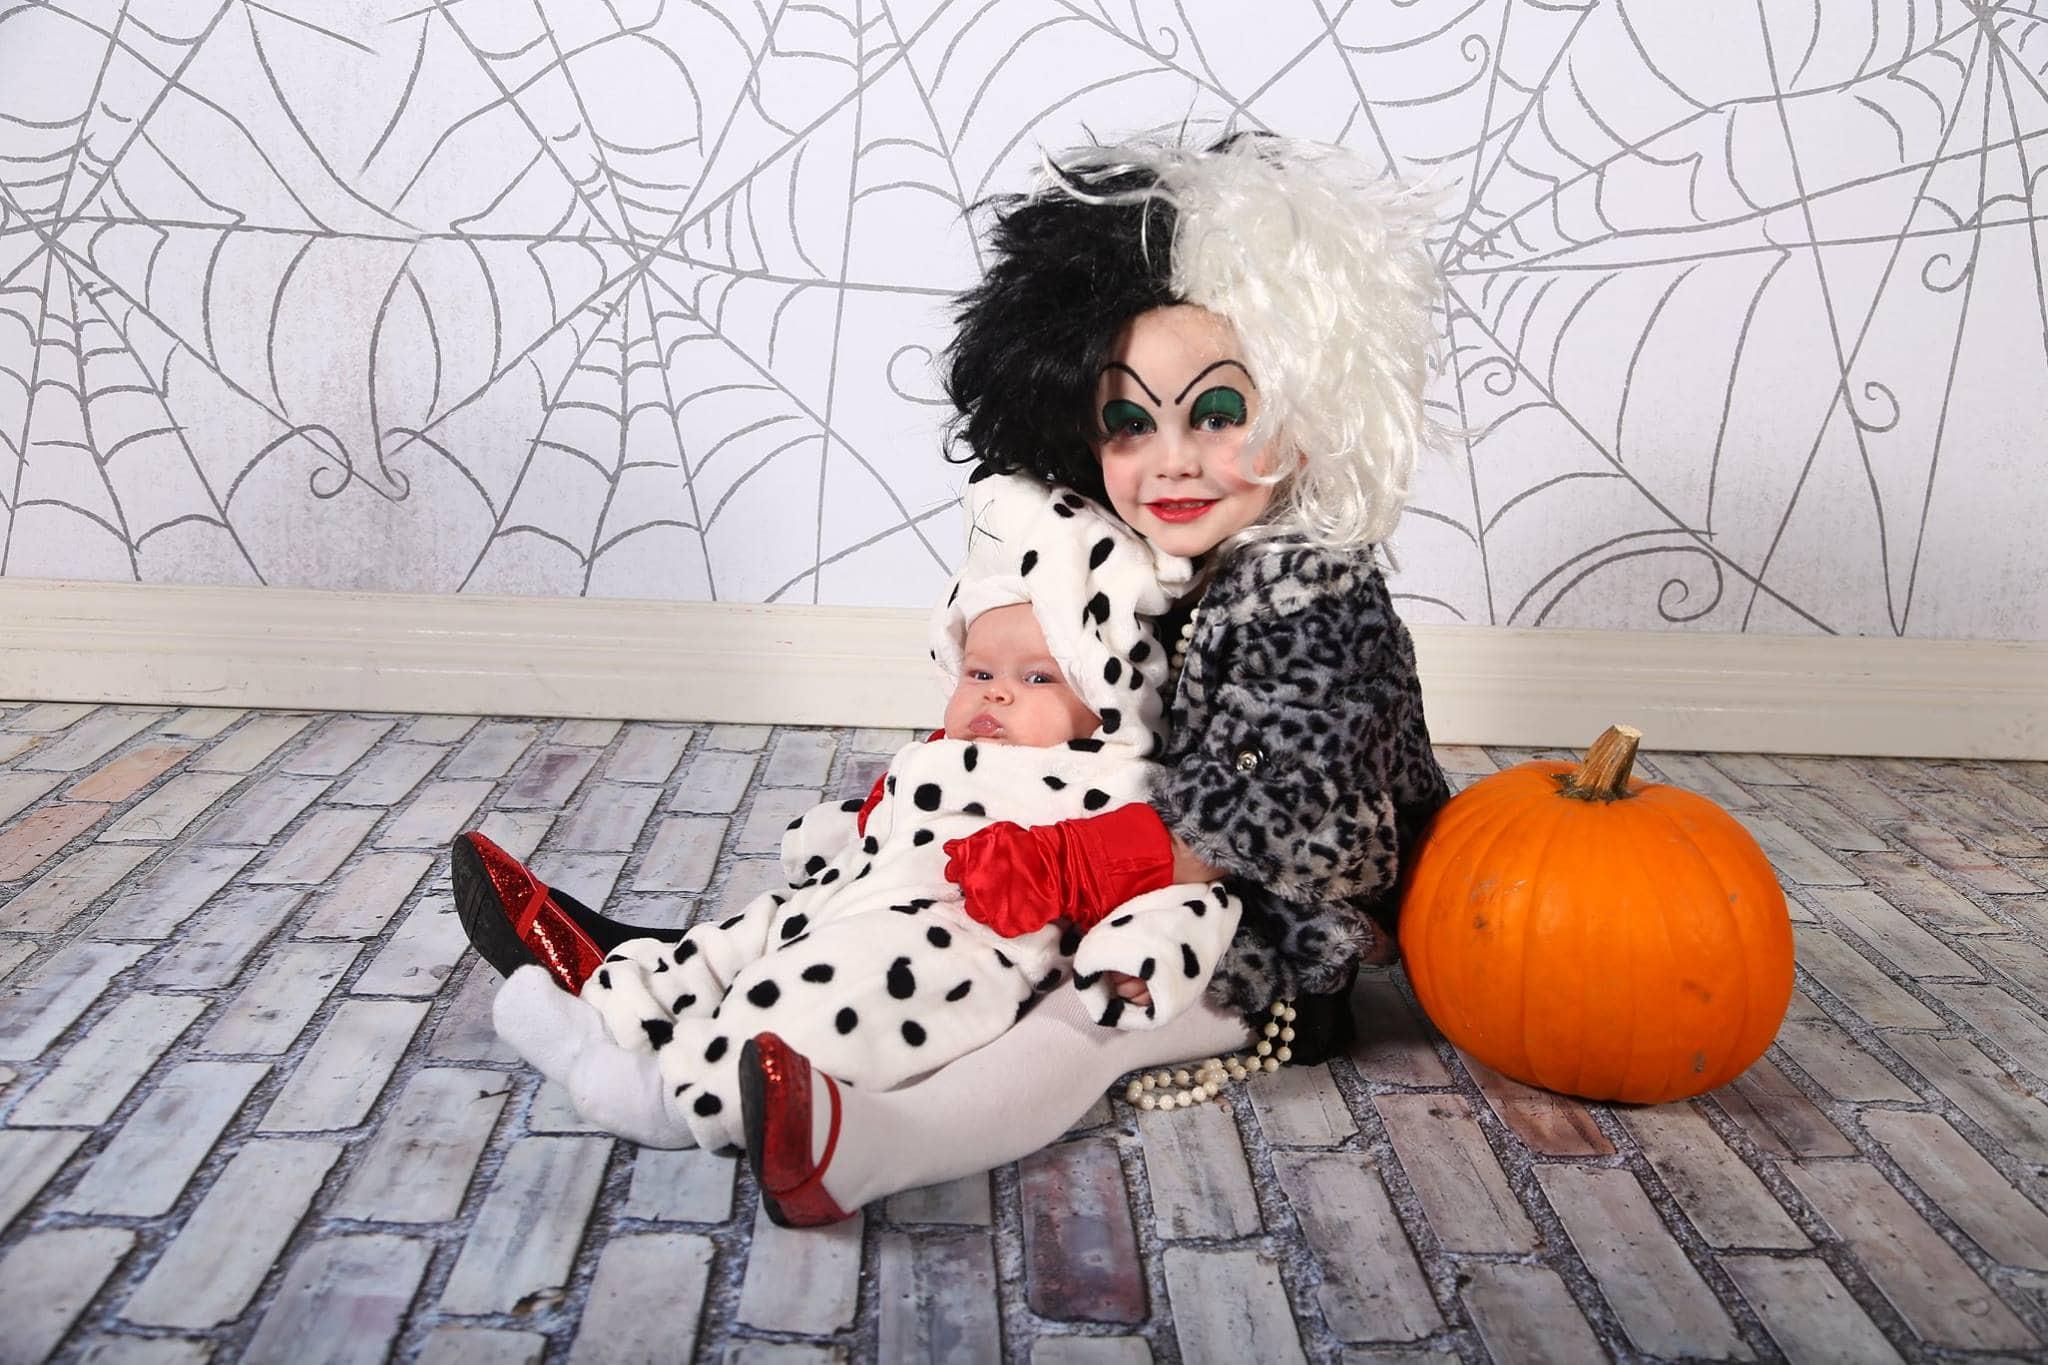 Girl wearing Cruella DeVil kids Halloween costume holds baby wearing dalmatian costume.